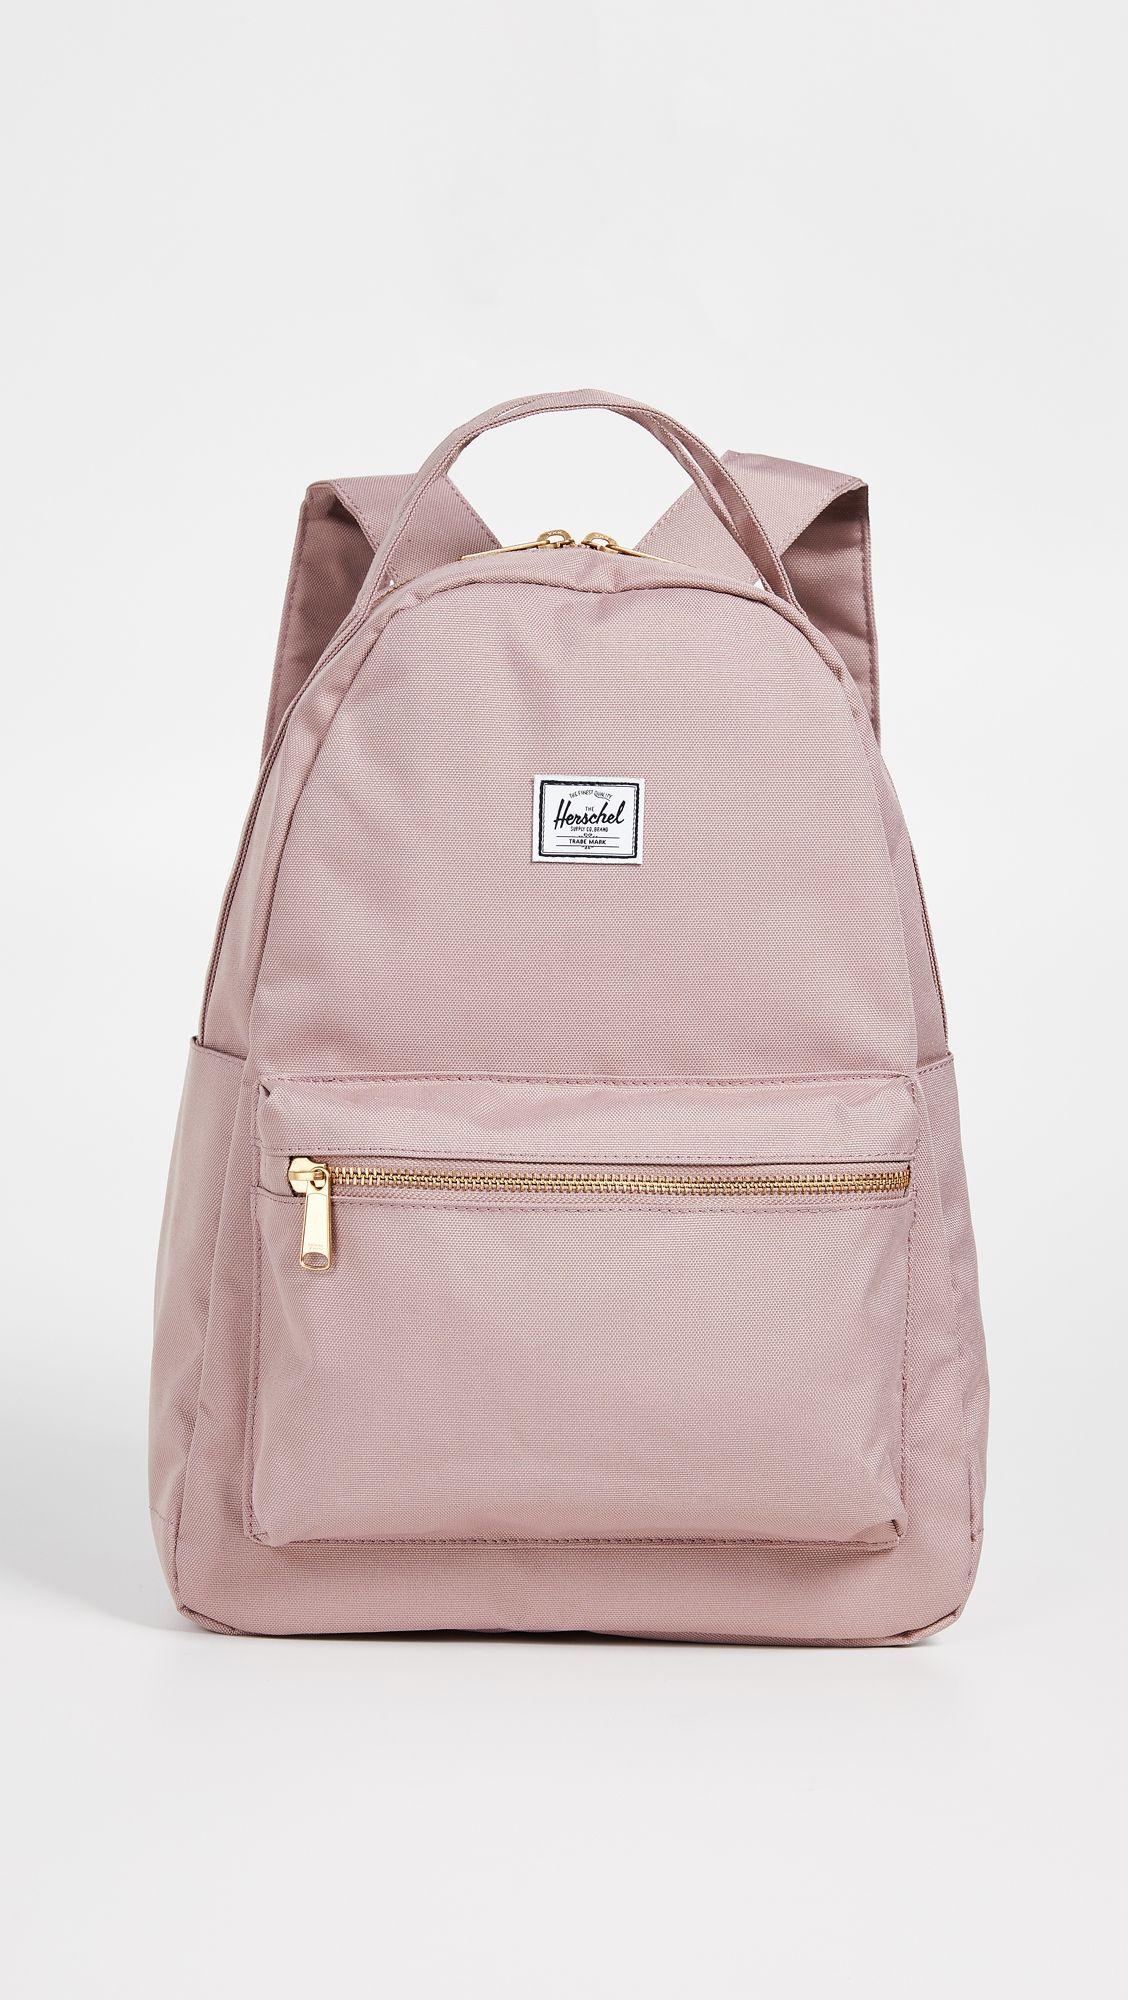 Herschel Supply Co. Nova Mid-Volume Backpack 3173c10cb6e85